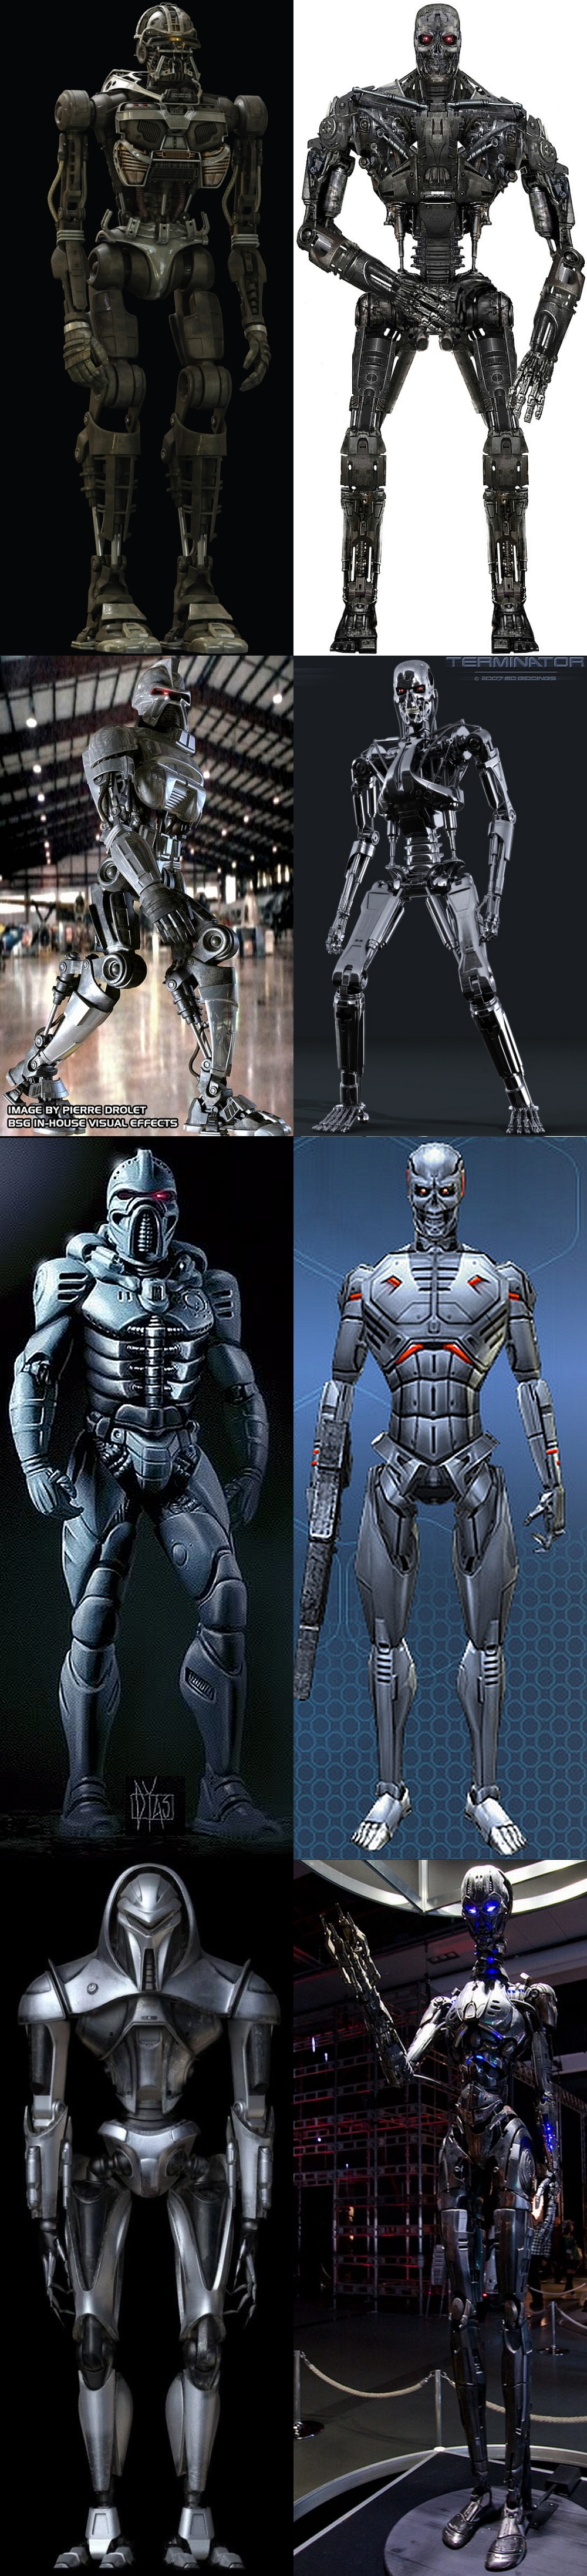 Cylon vs Termina...T 950 Terminator